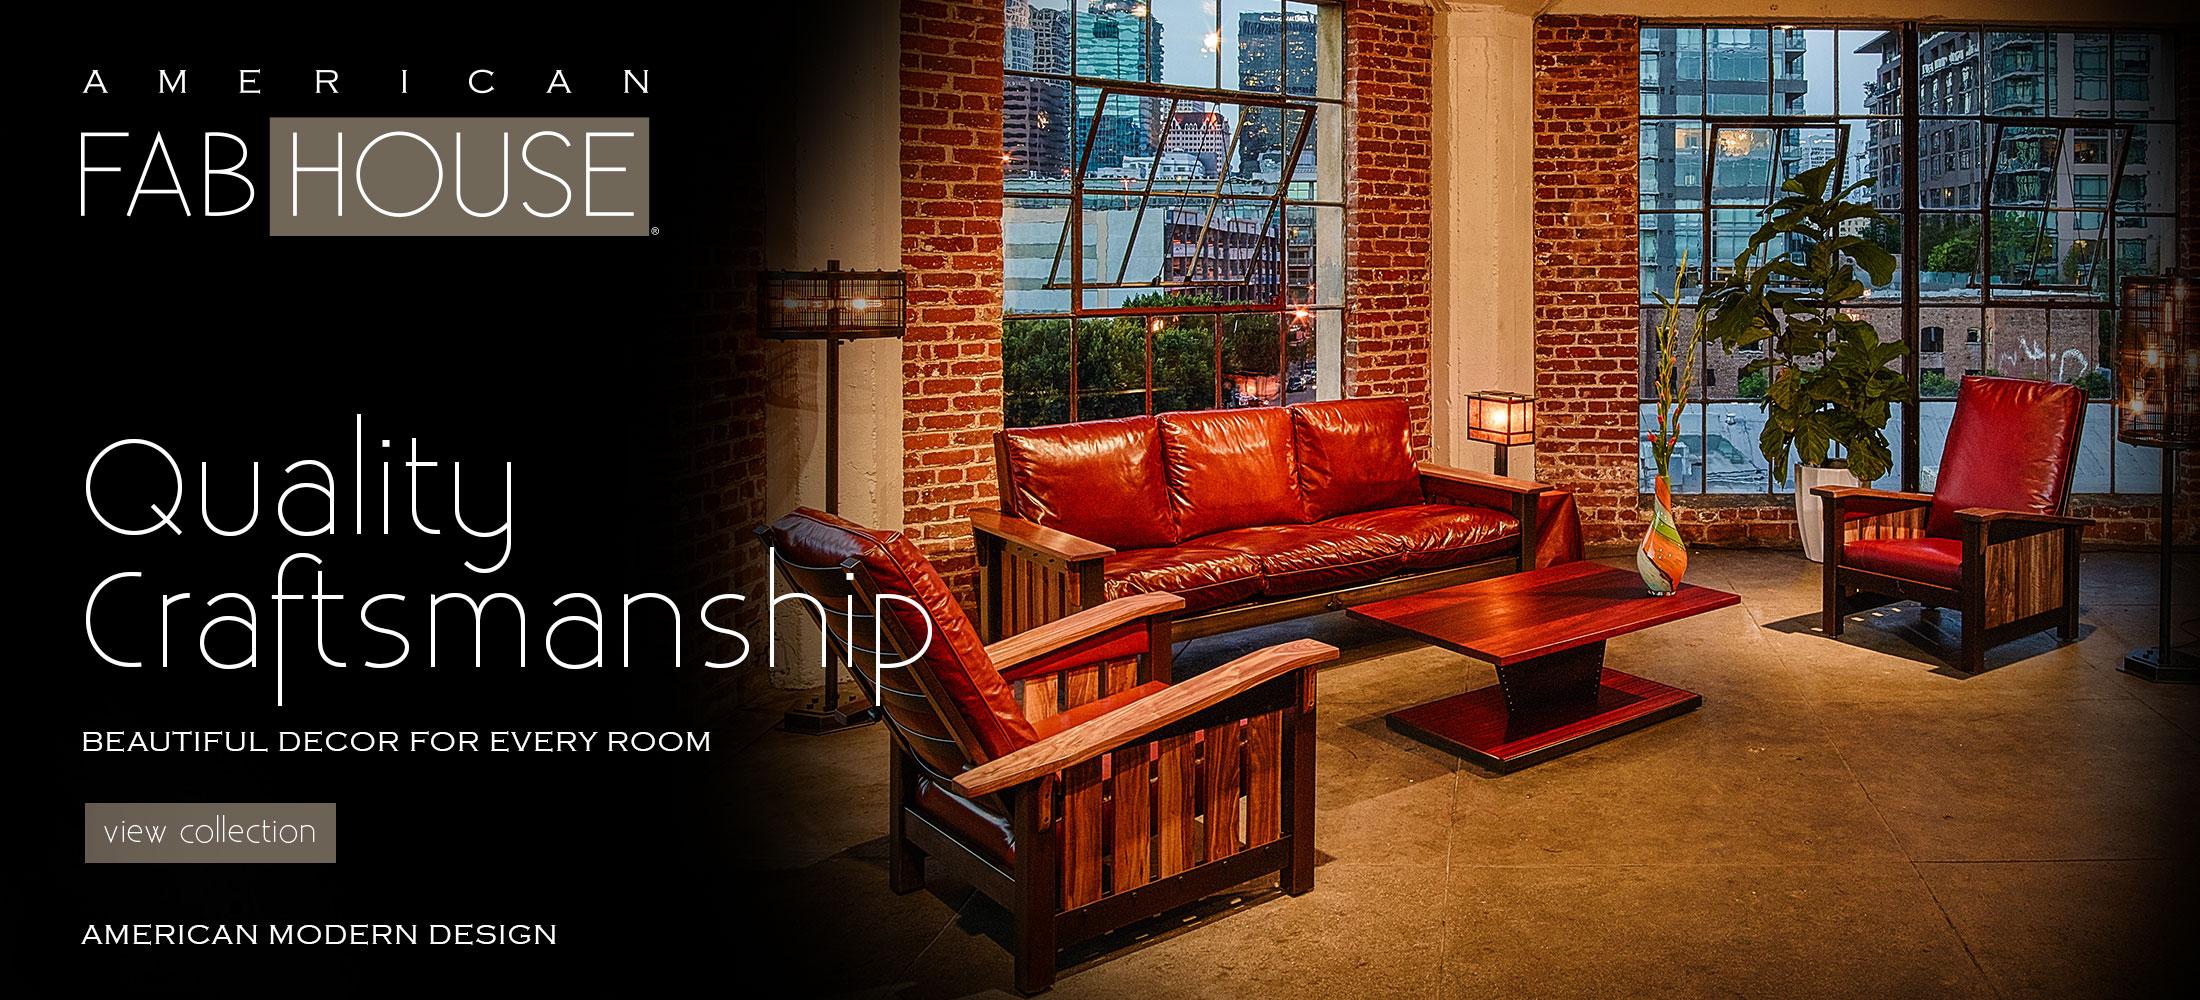 USA Made Quality Craftsmanship American Fabhouse